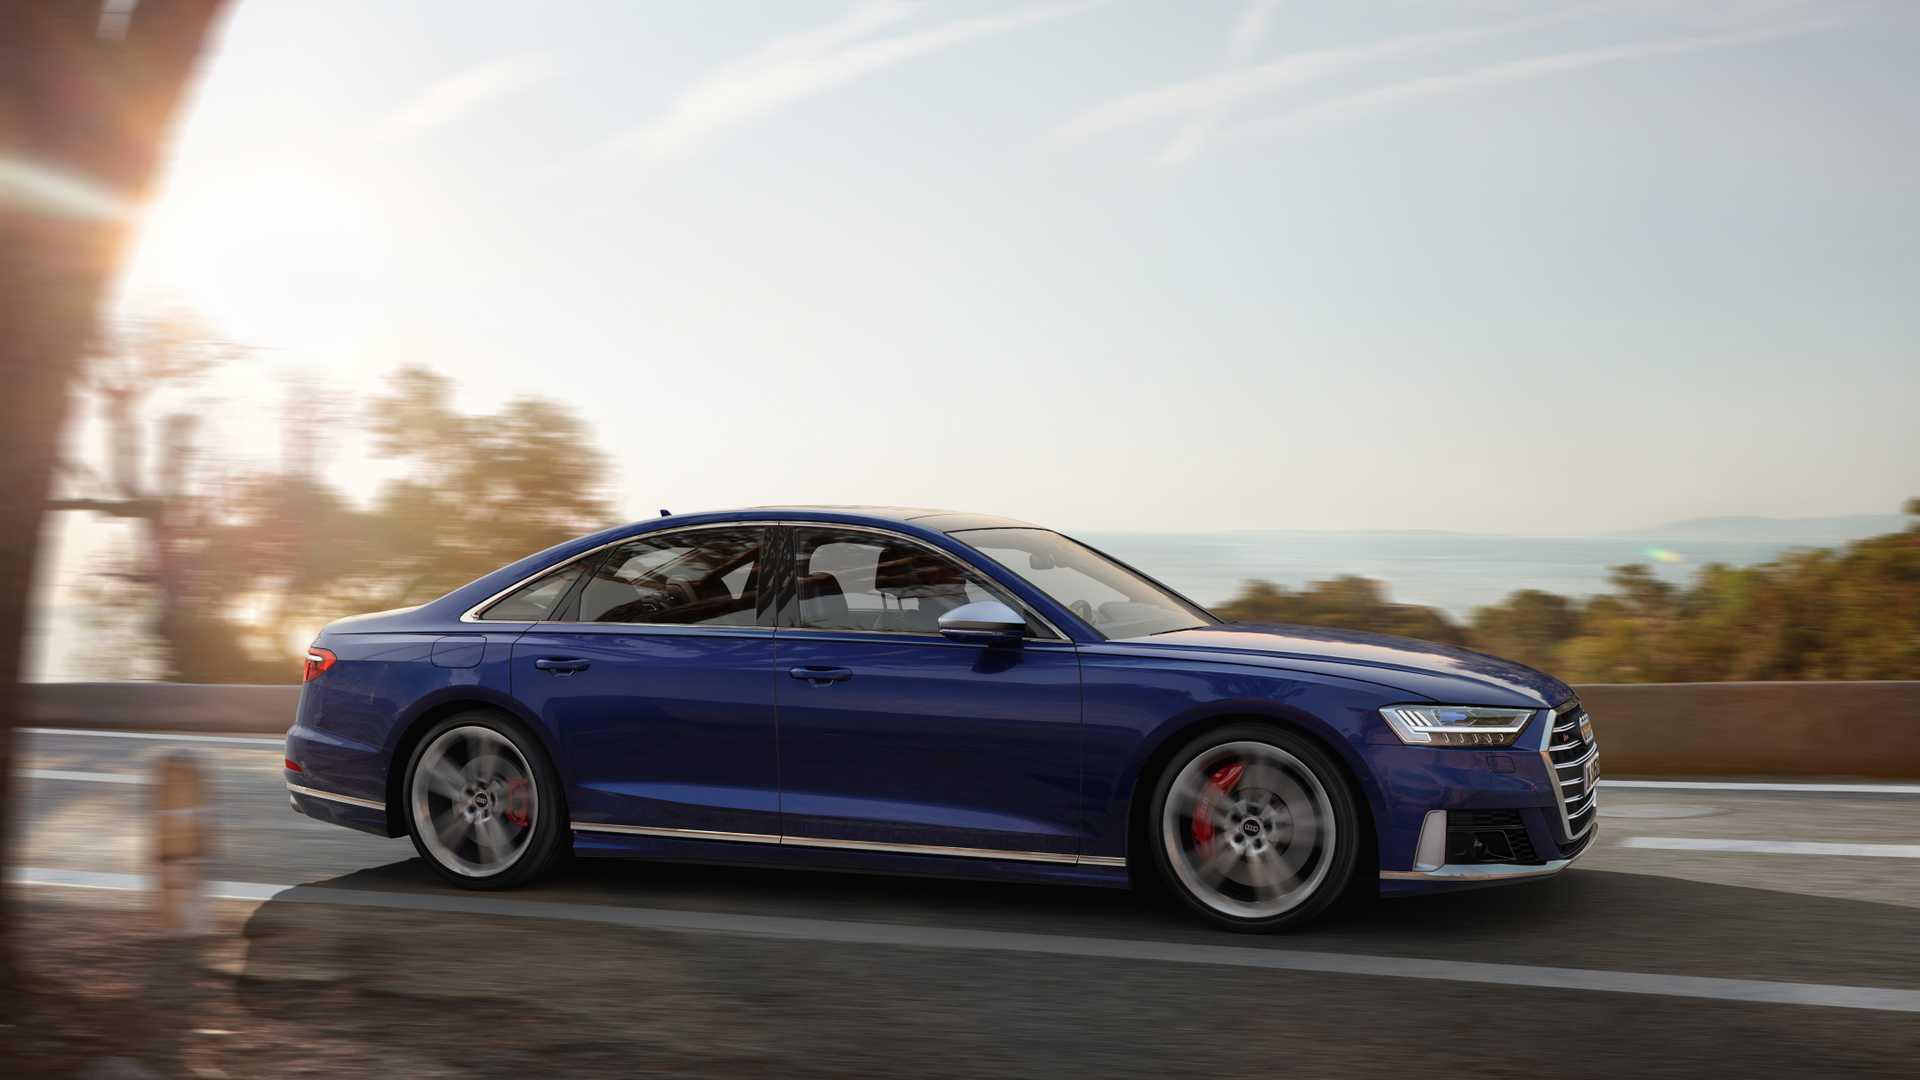 Četvrta generacija modela Audi S8